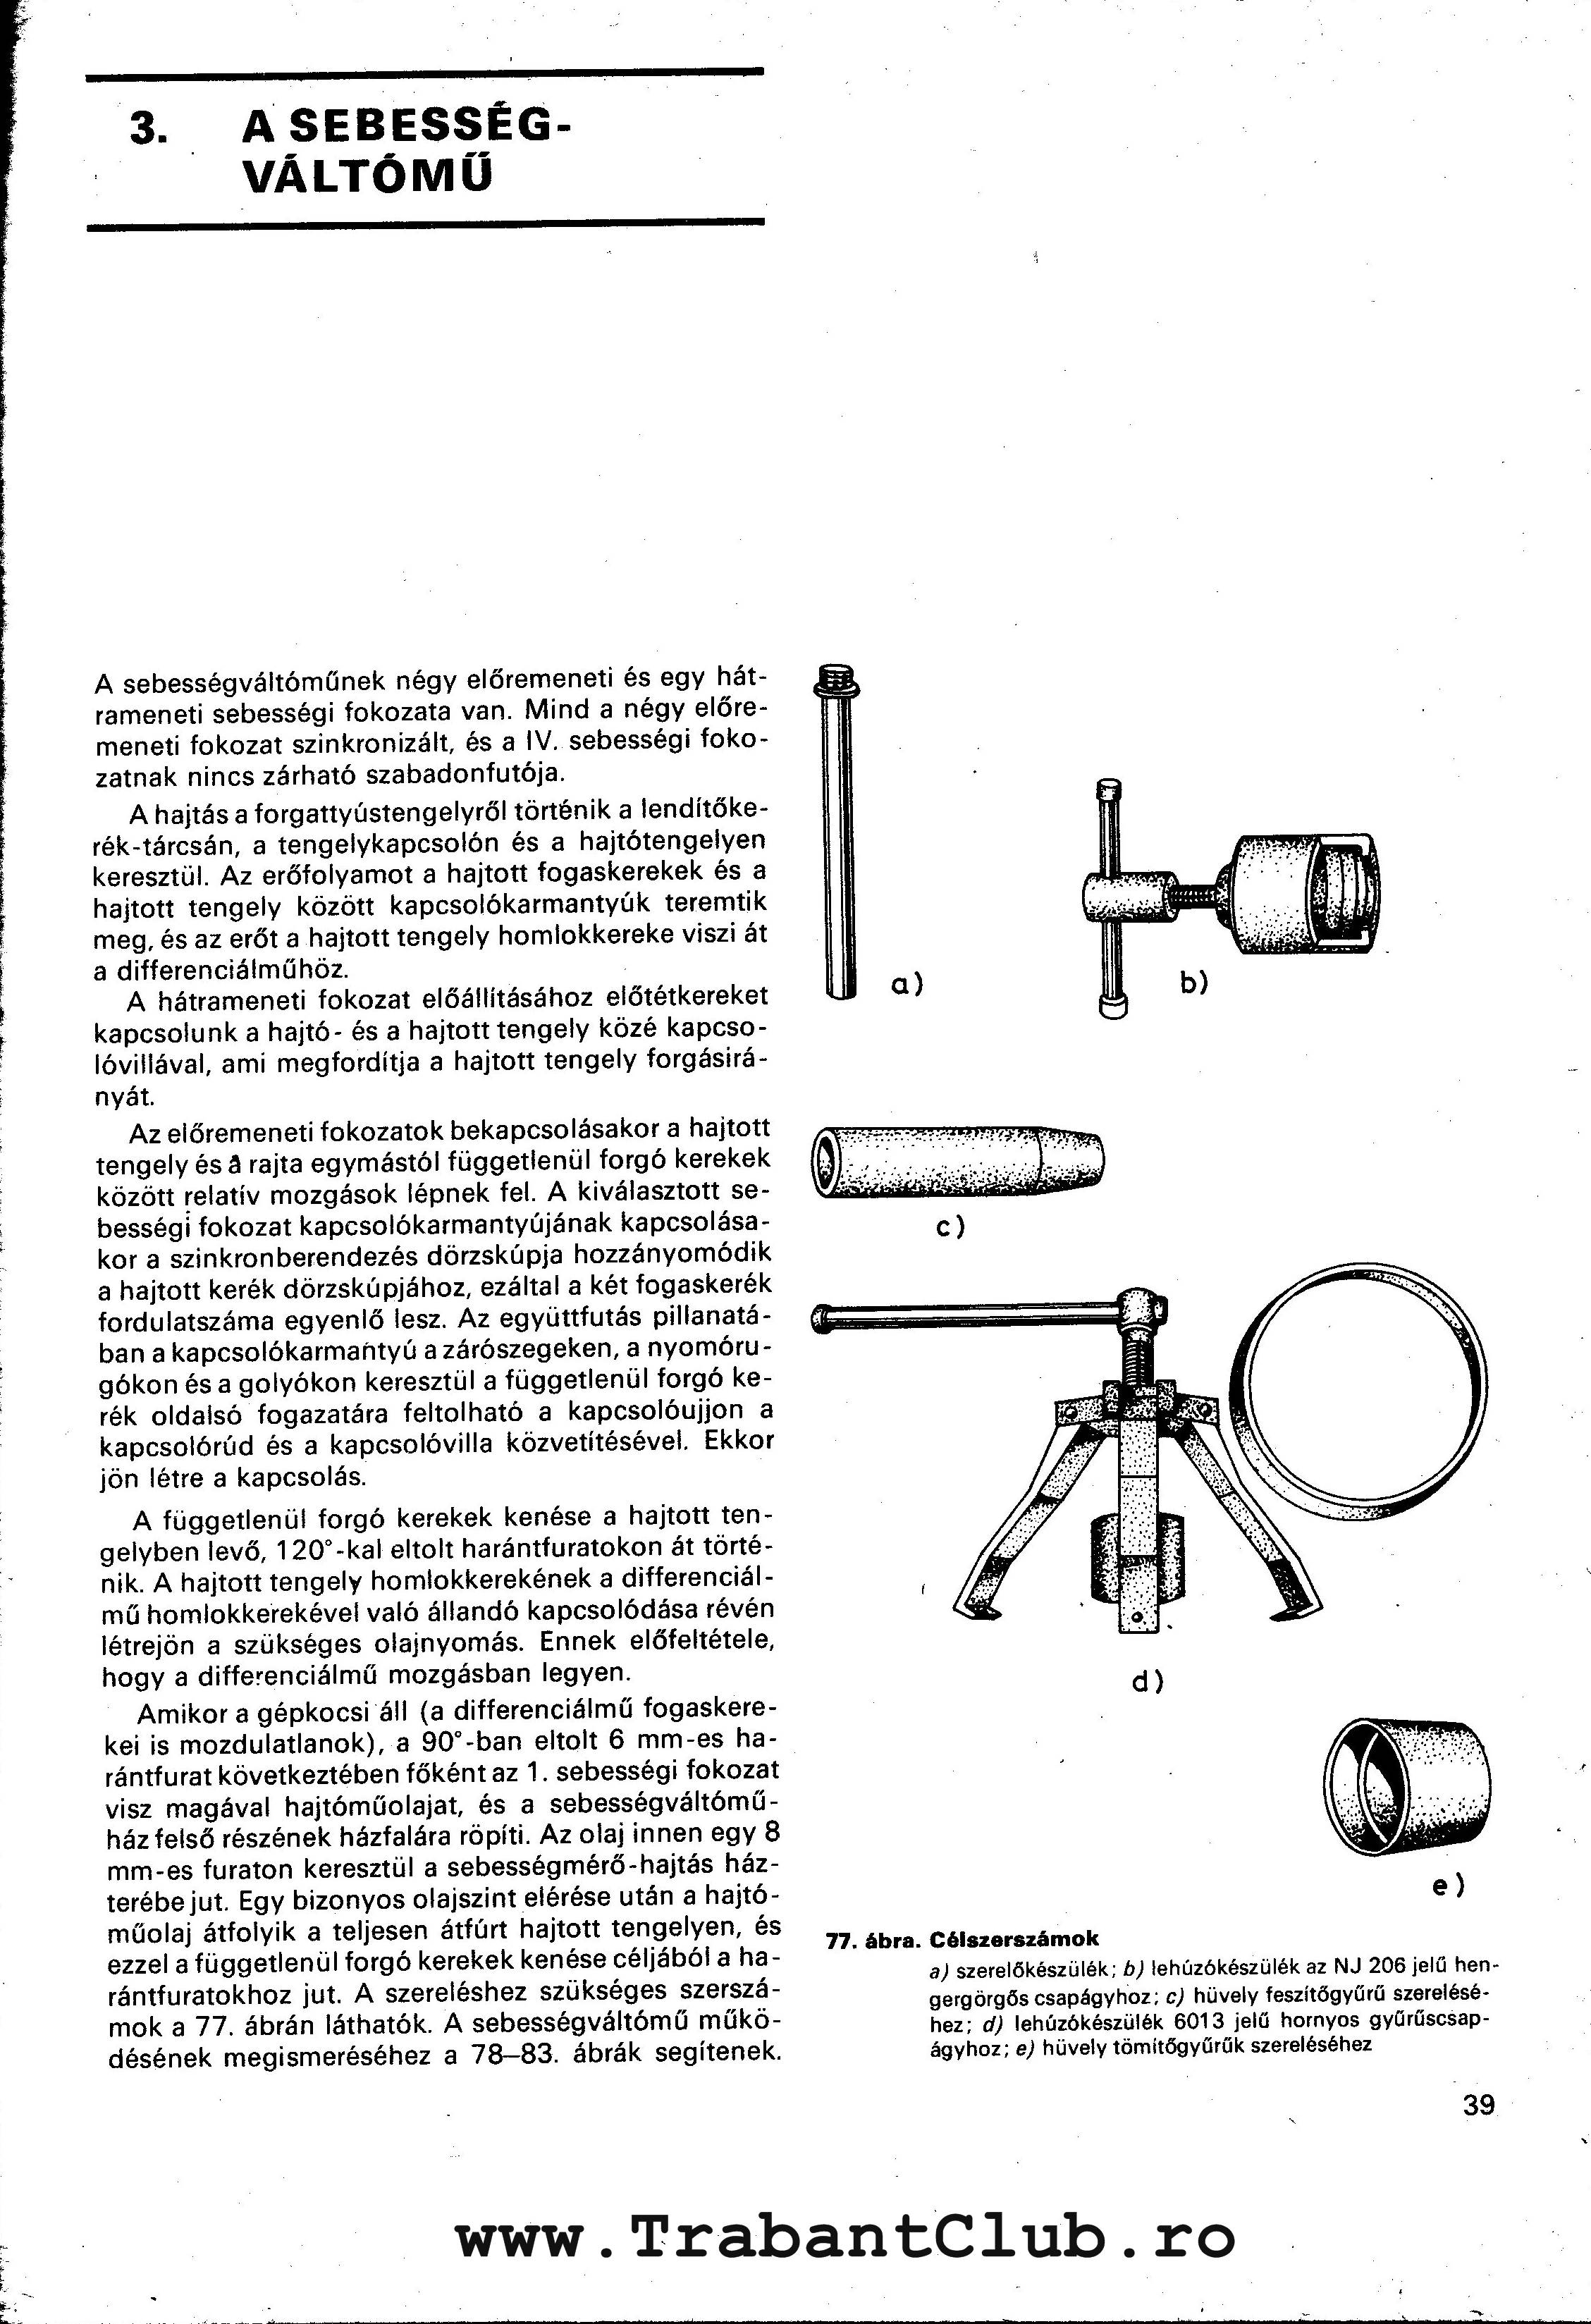 TRABANT 601 Javitasi Segedkonyv039.jpg